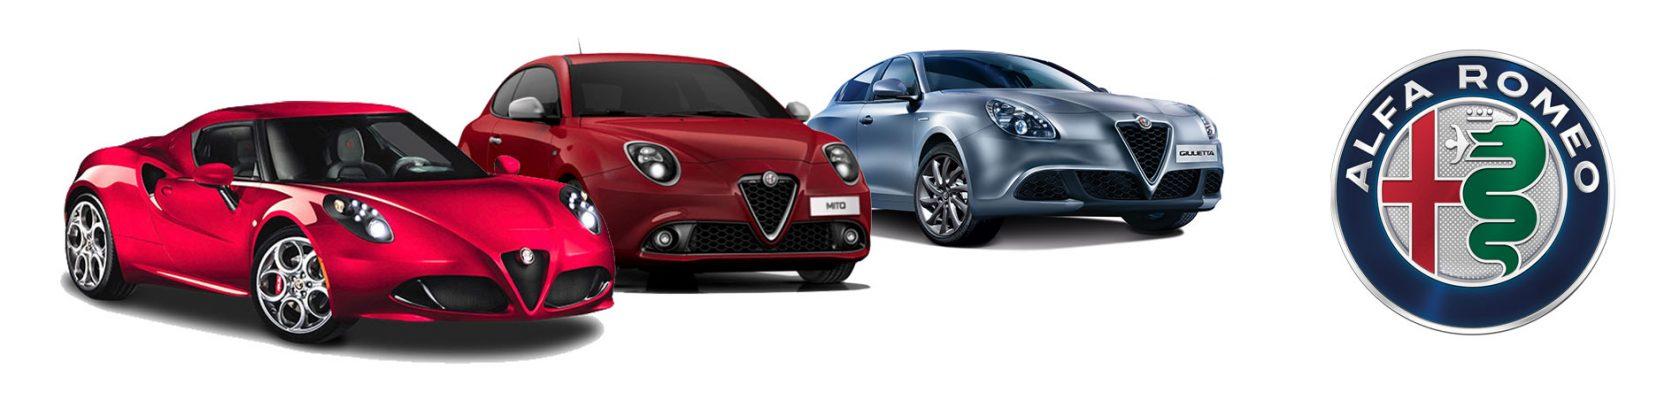 Alfa Romeo 4C, Alfa Romeo MiTo & Alfa Romeo Giulietta